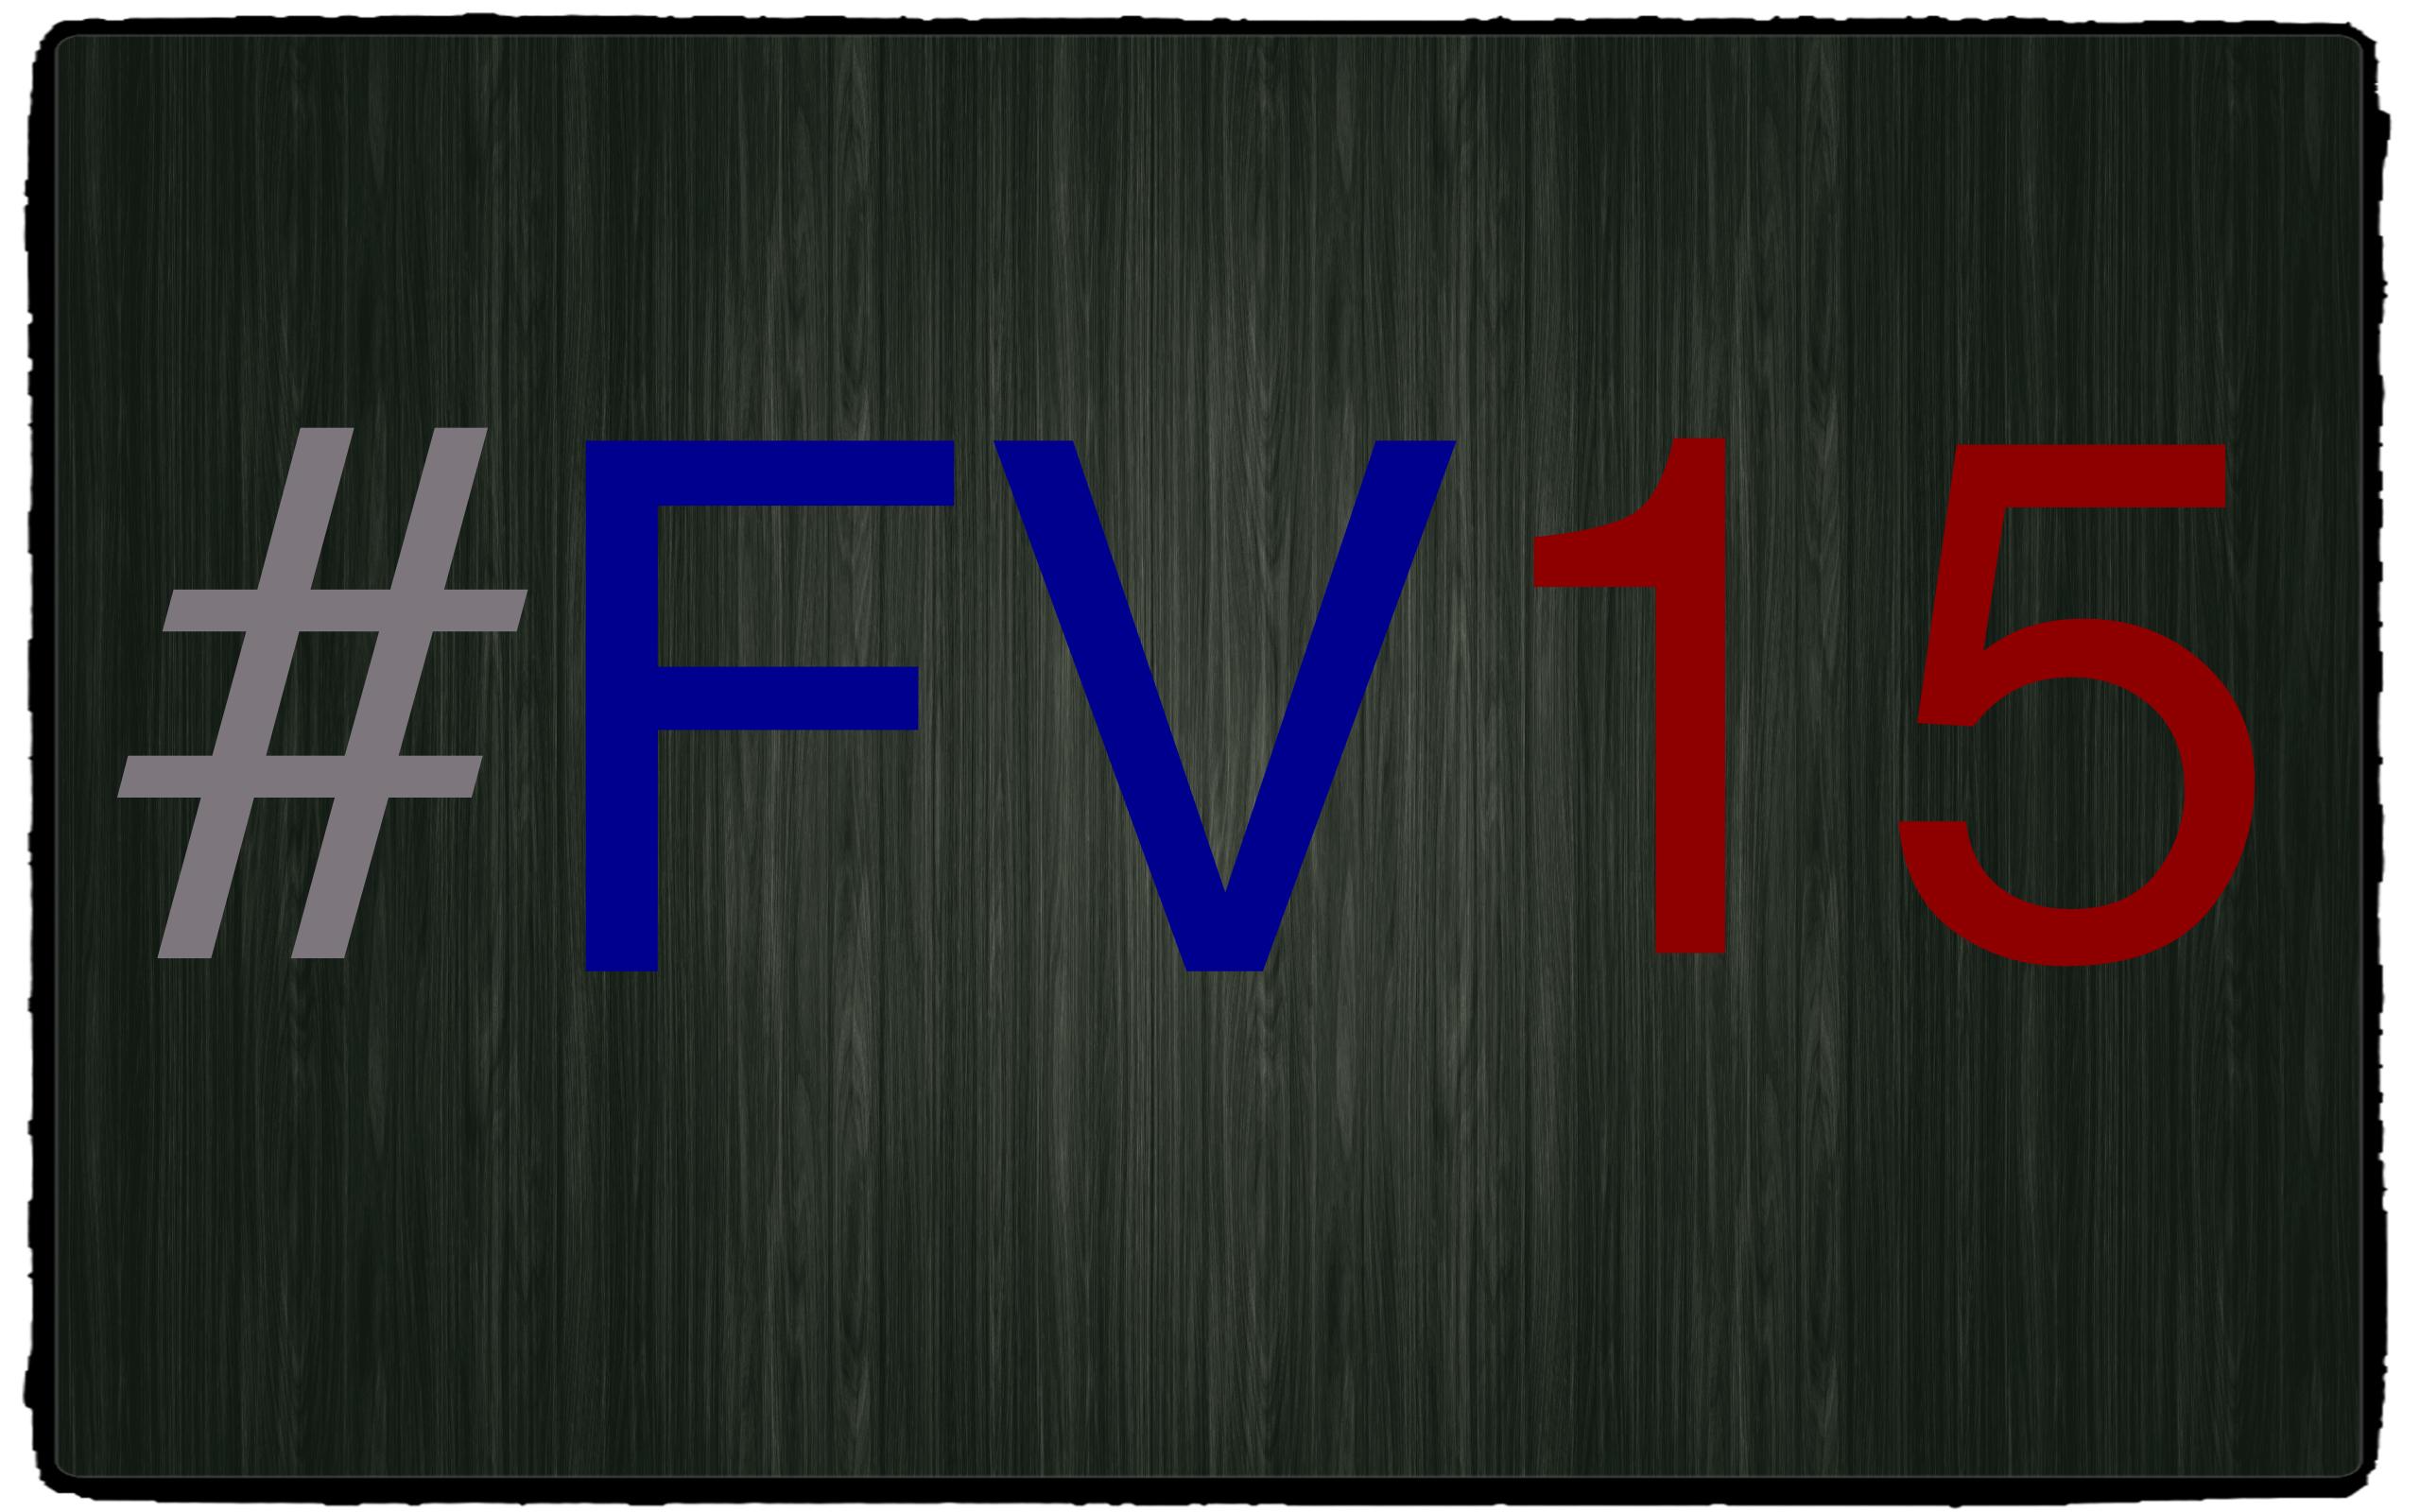 #FV15